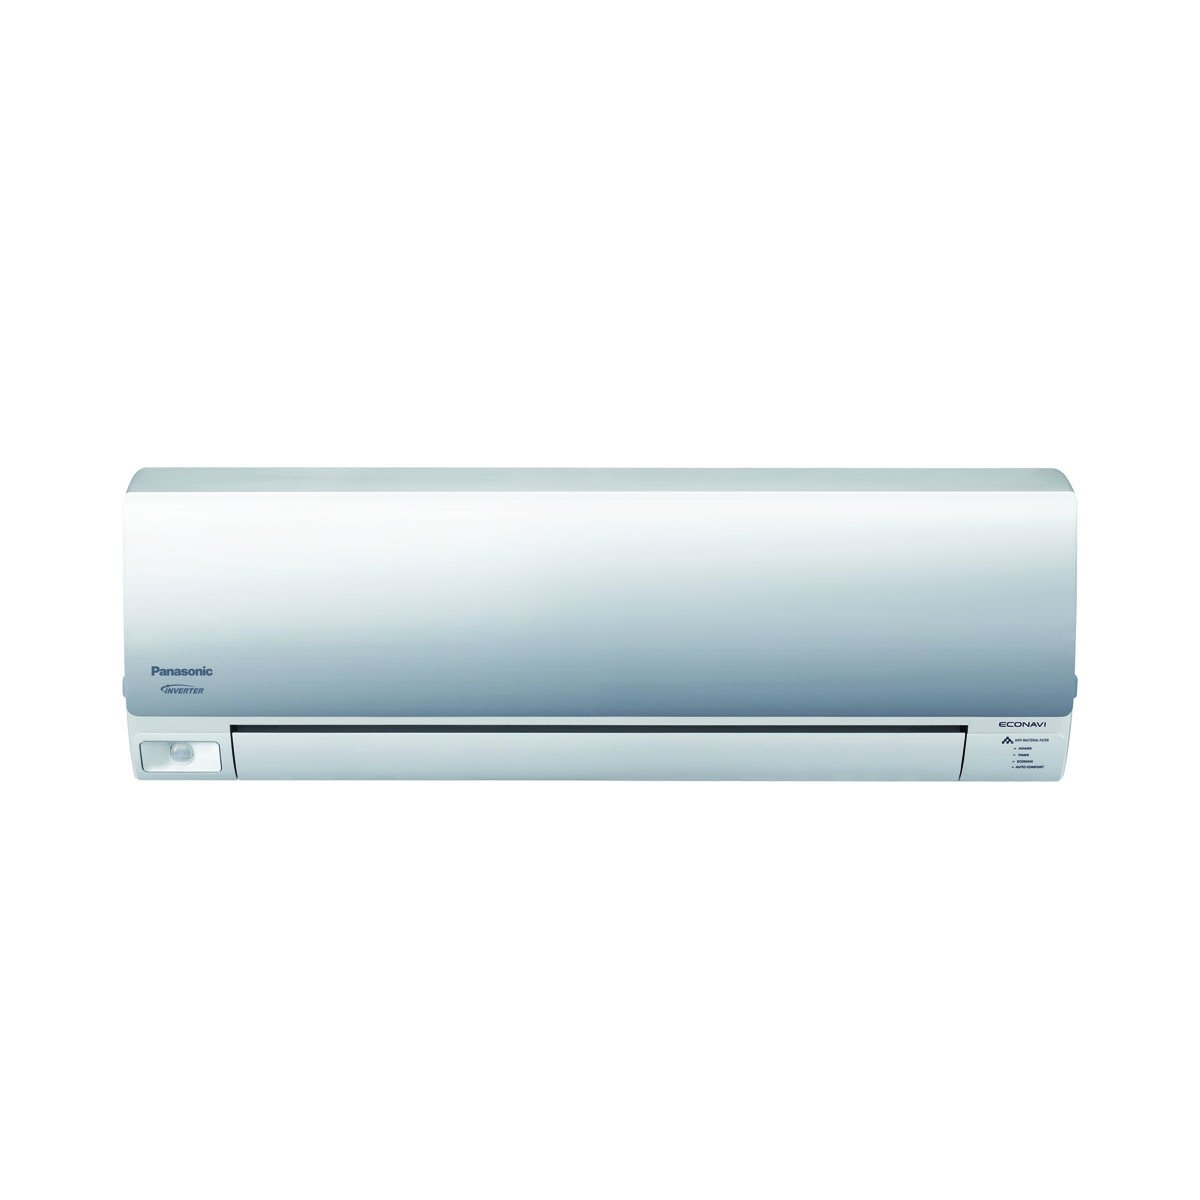 Aire acondicionado inverter s fr o silver monosensor for Aire acondicionado panasonic precios